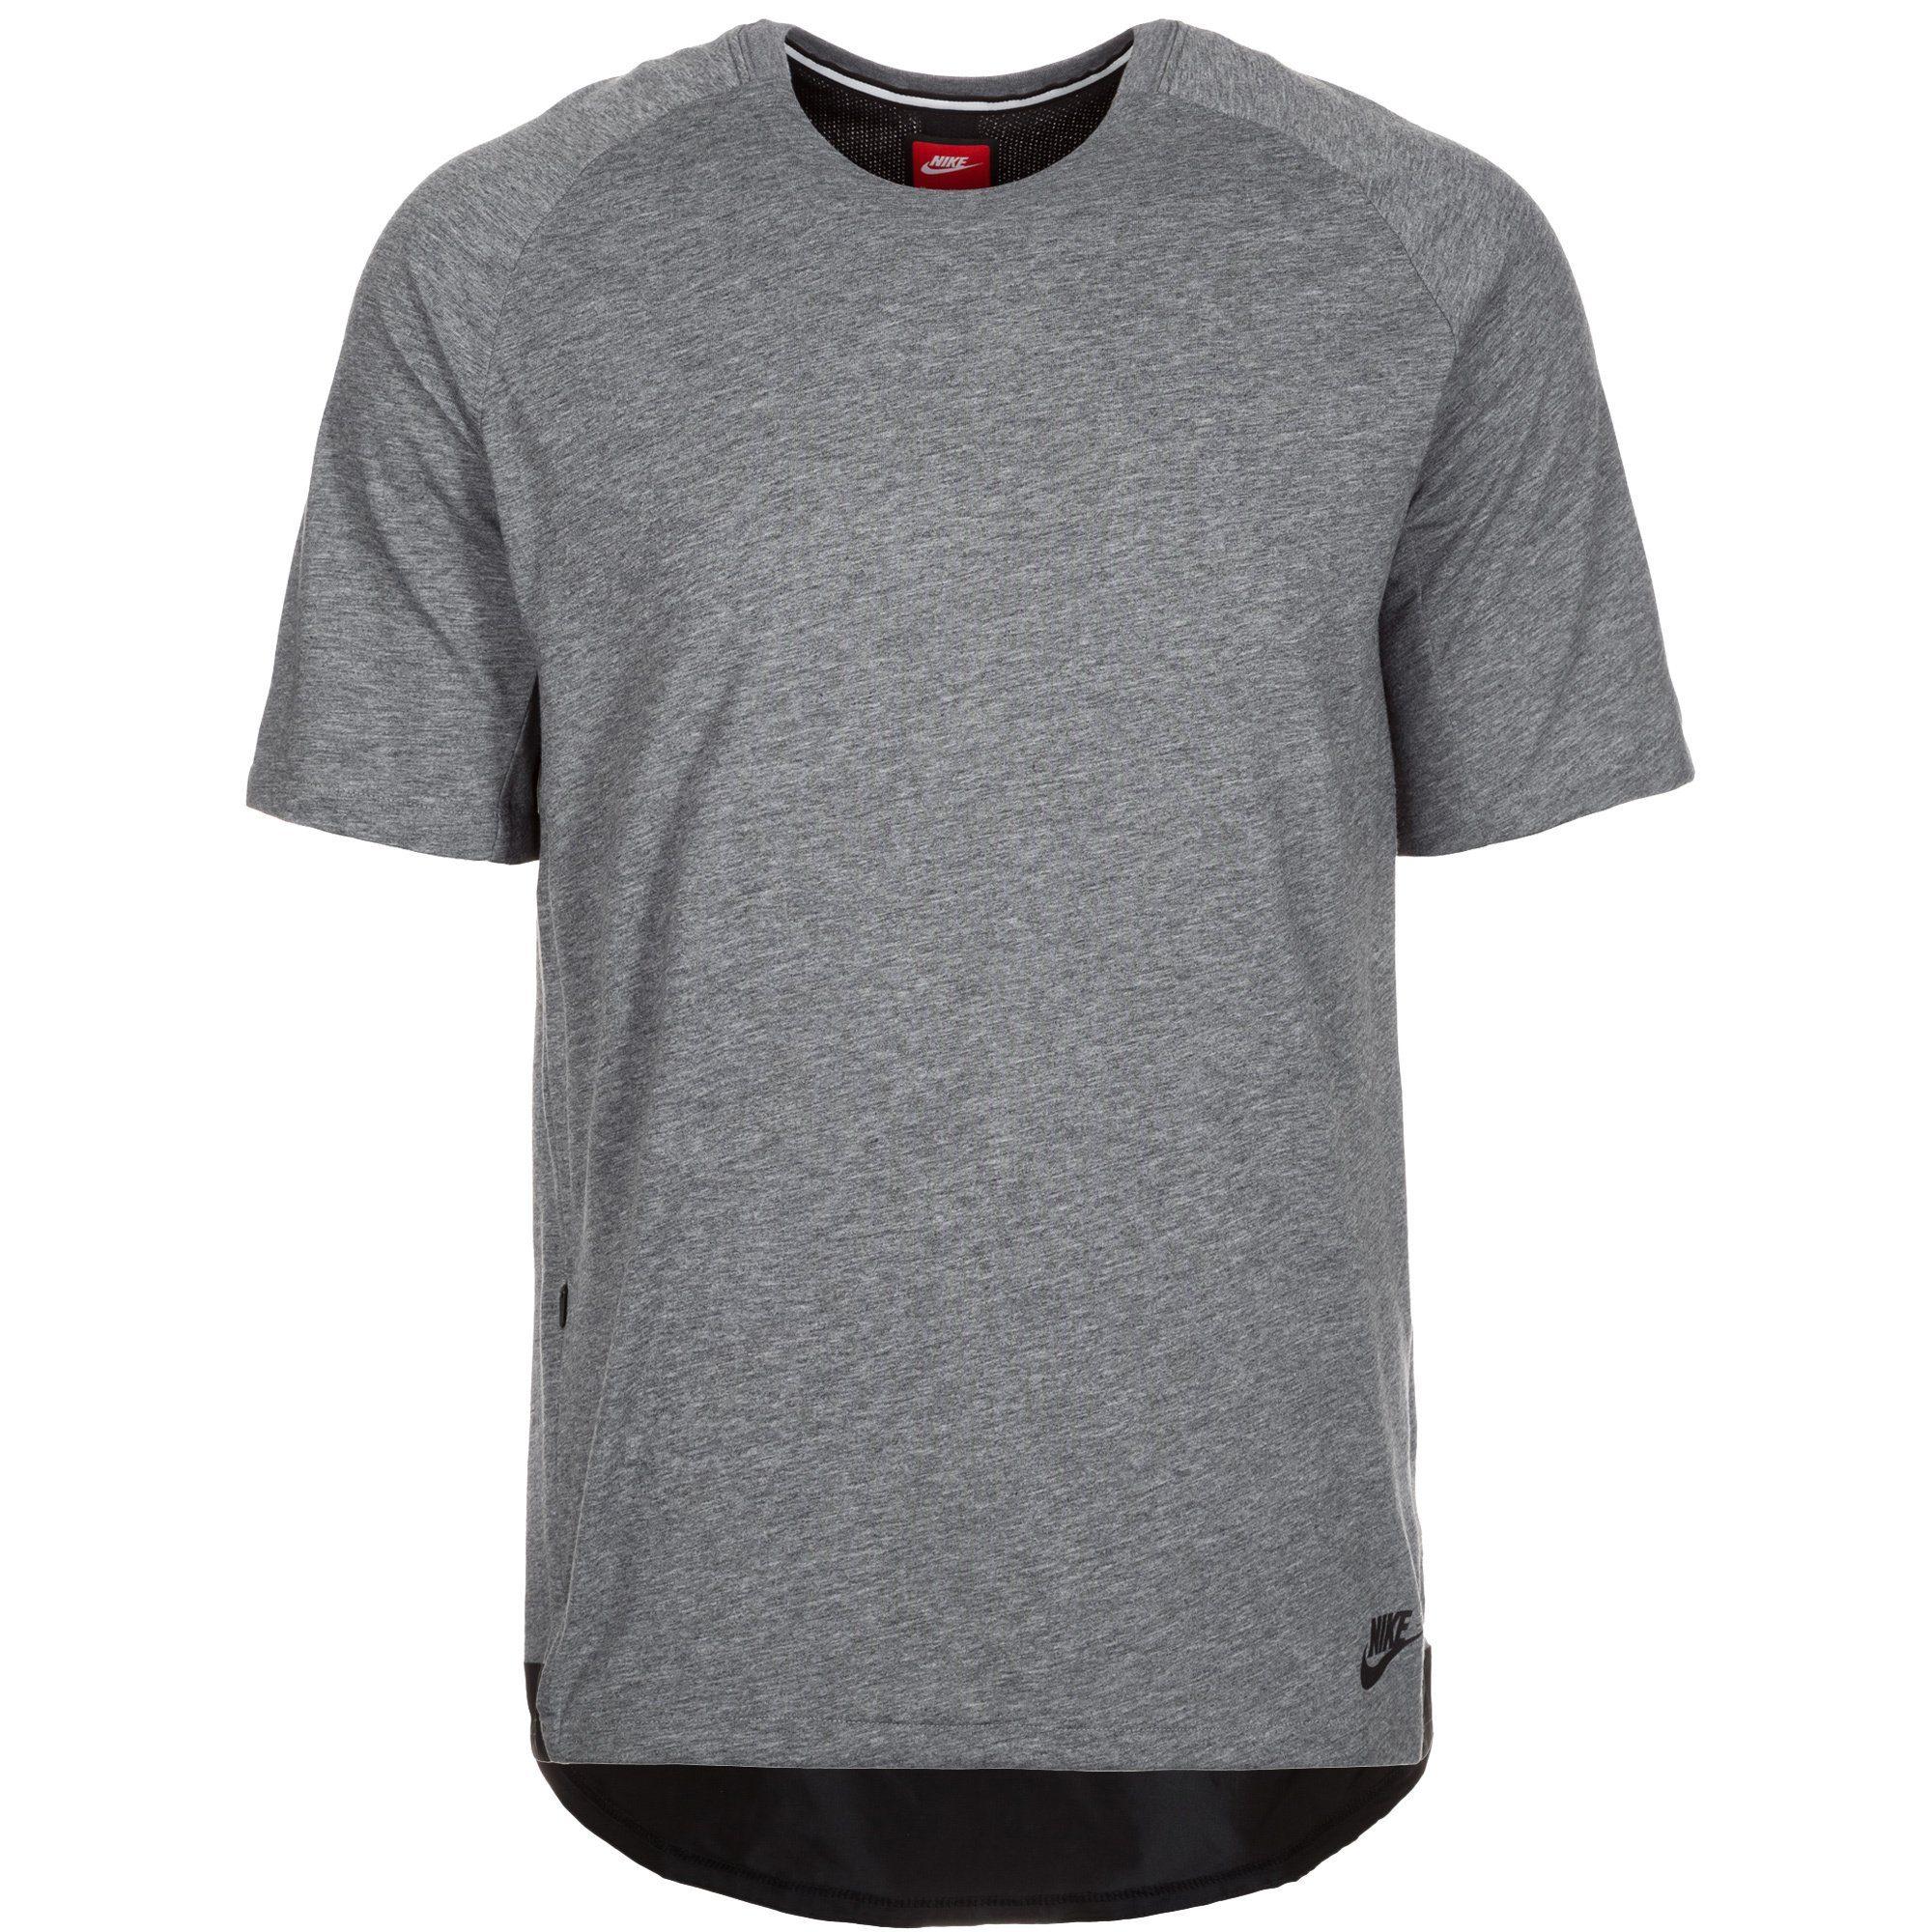 Nike Sportswear T-Shirt Bonded | Sportbekleidung > Sportshirts > T-Shirts | Nike Sportswear